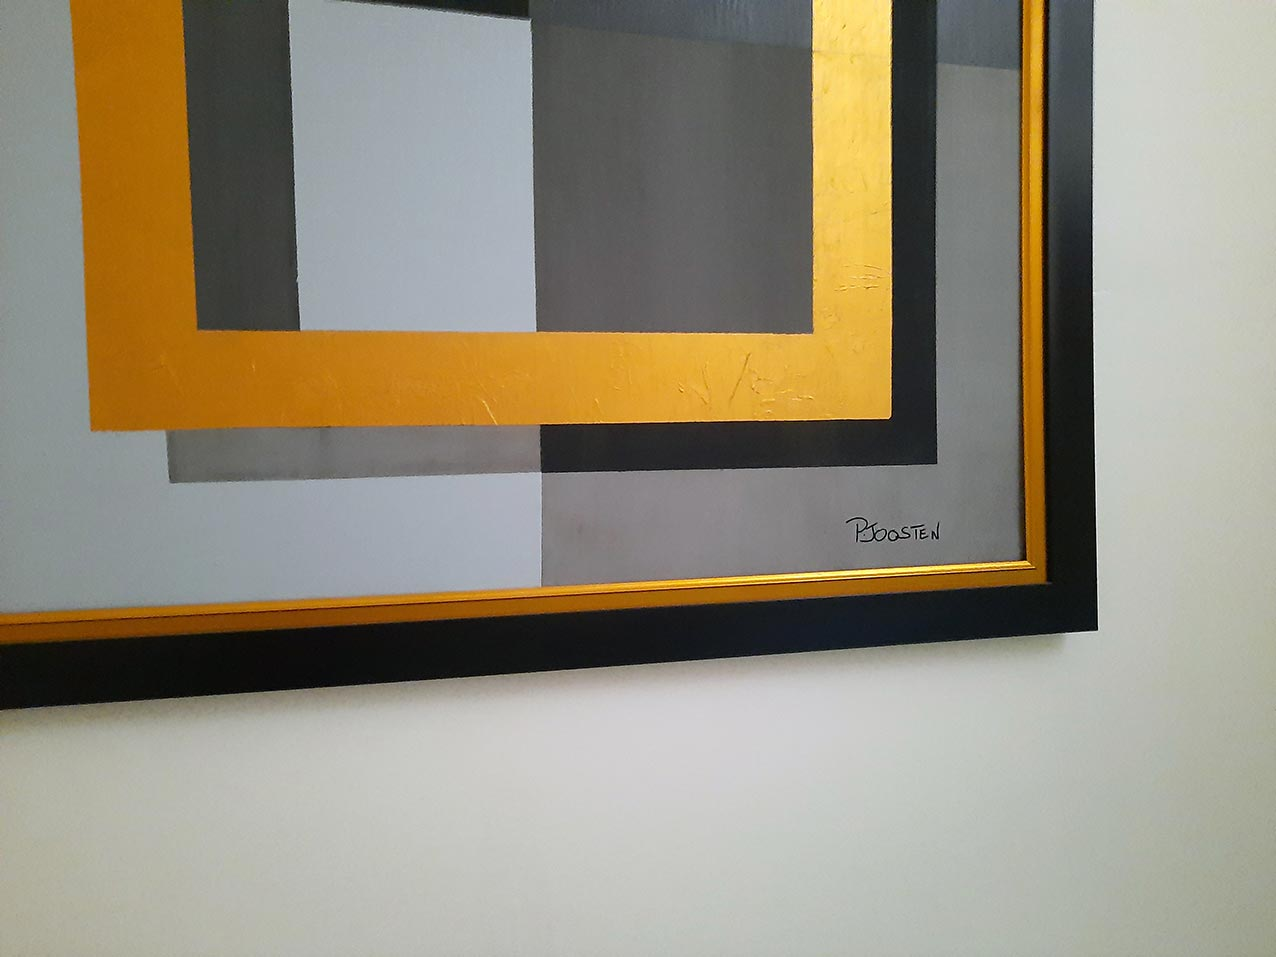 Squares-Part-I-Patrick-Joosten—front-signature